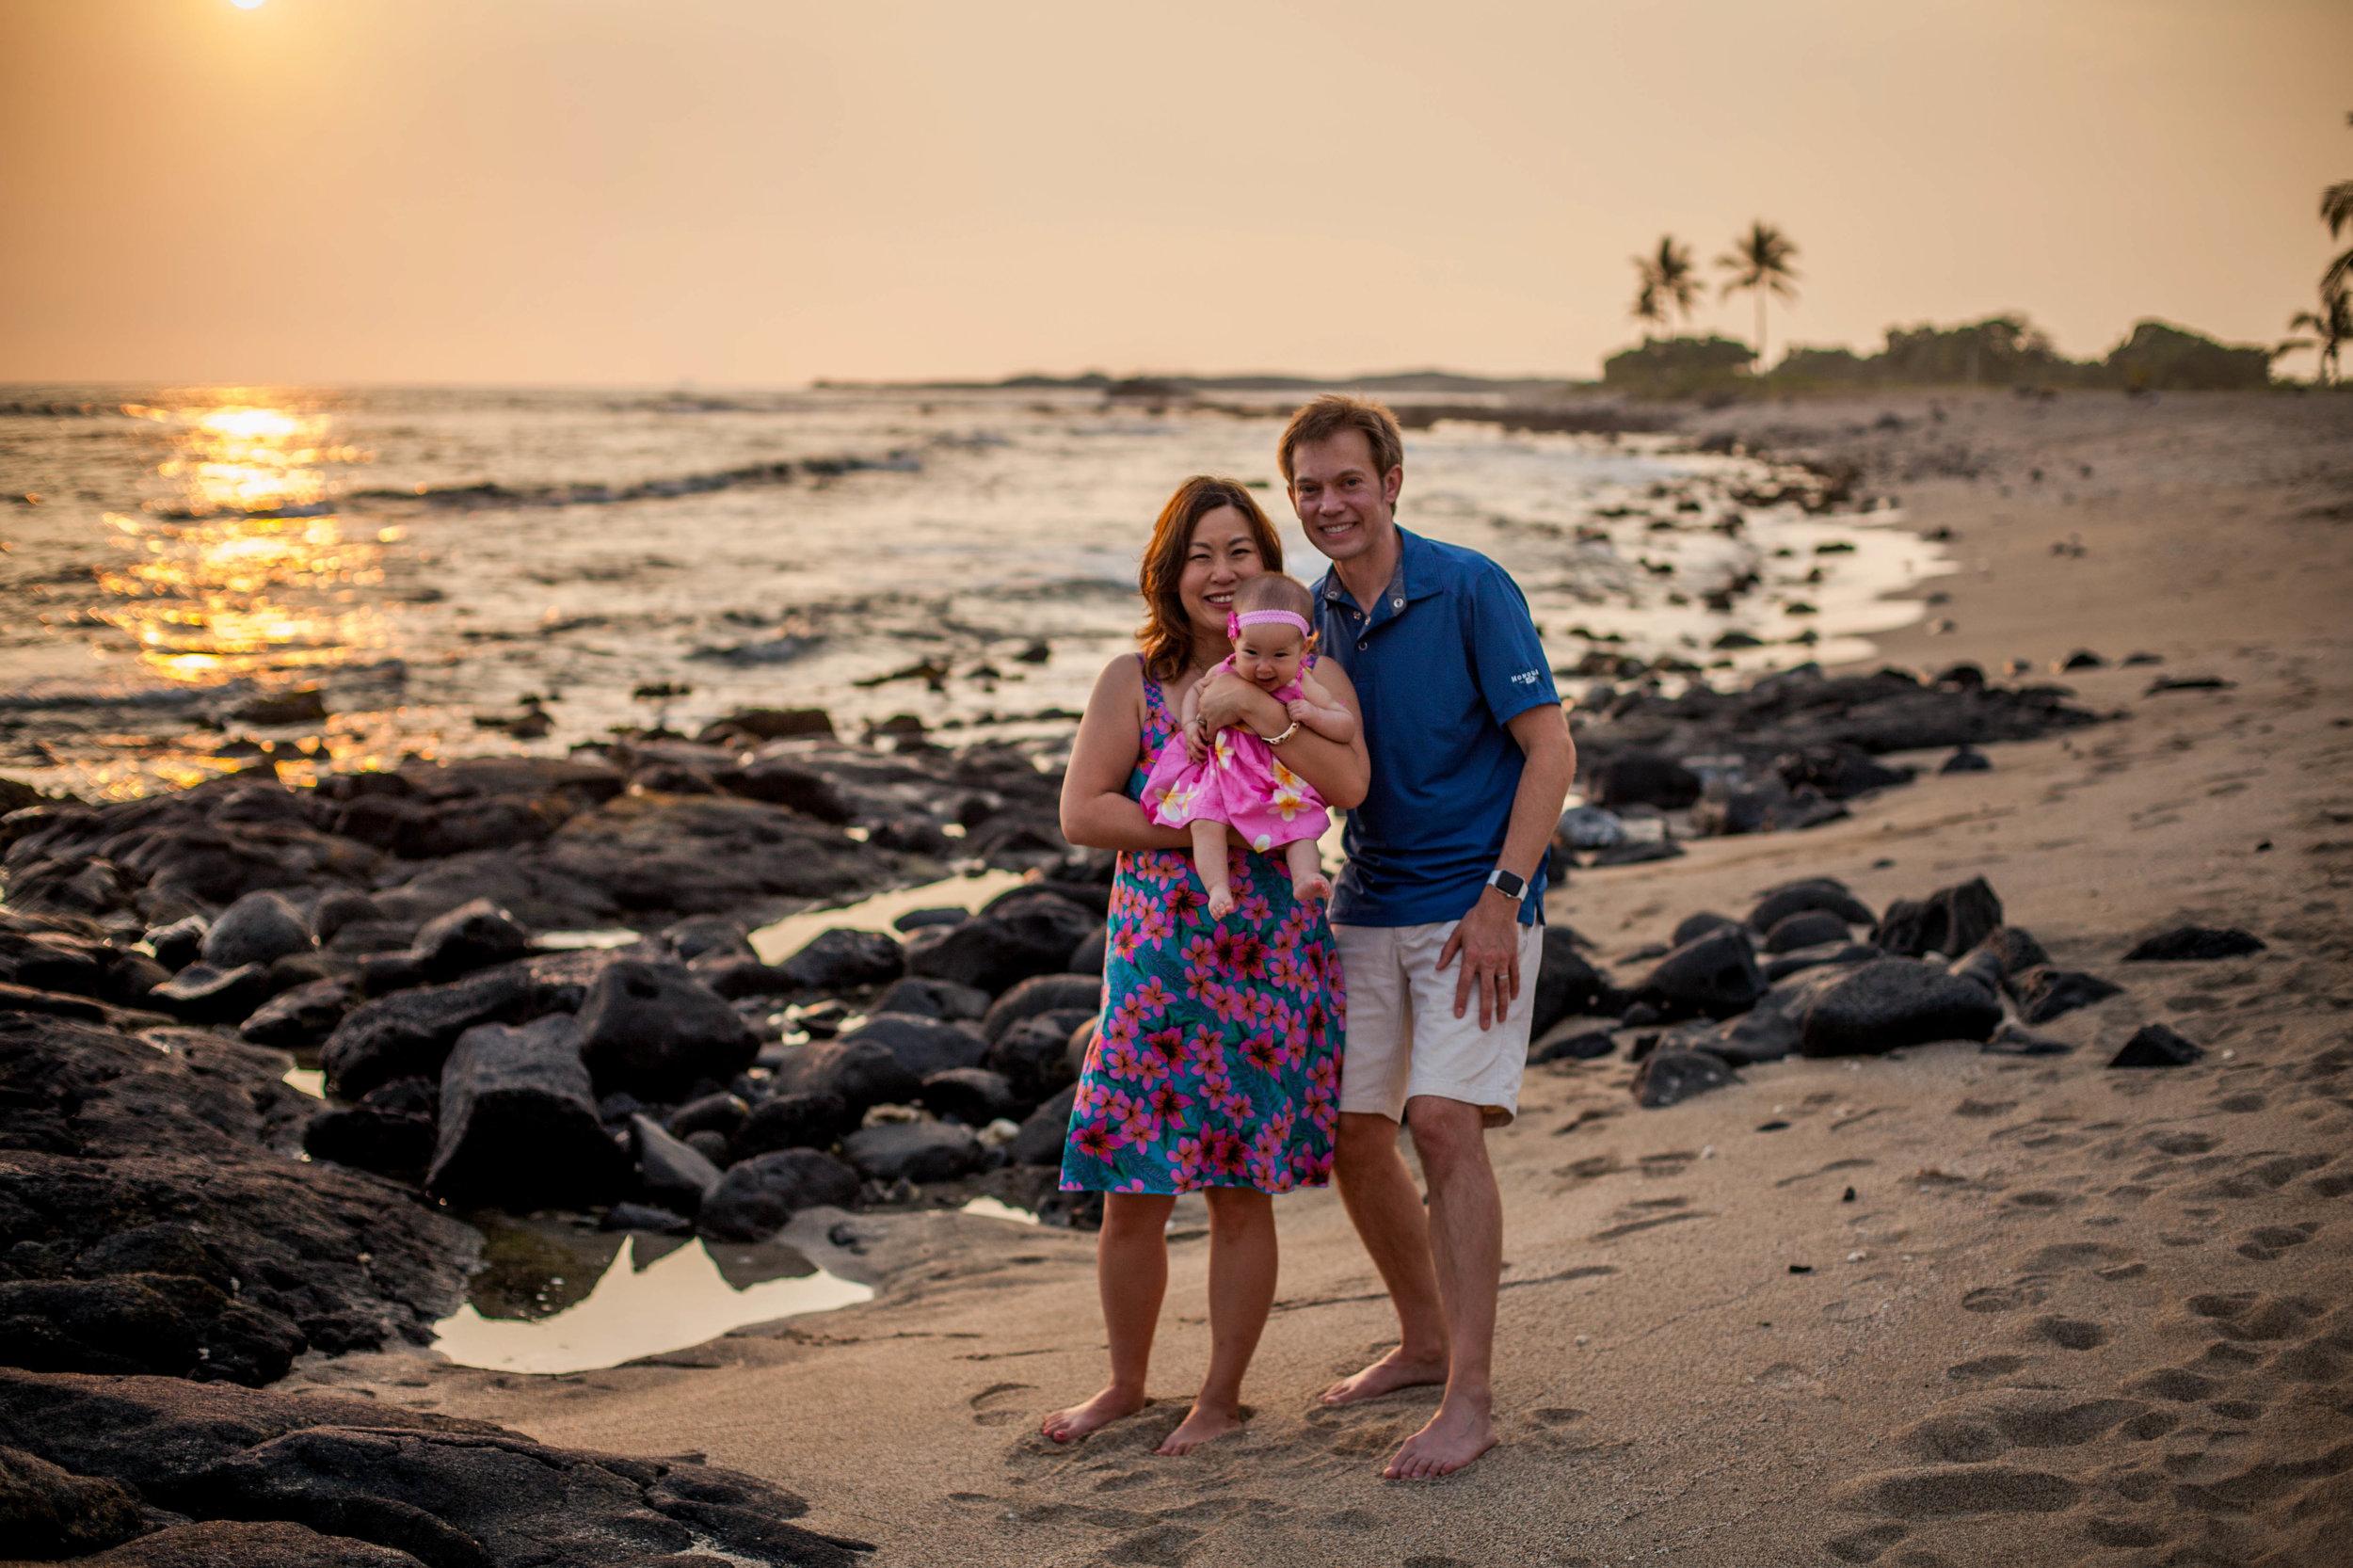 big island hawaii old kona airport beach family © kelilina photography 20170405181028.jpg